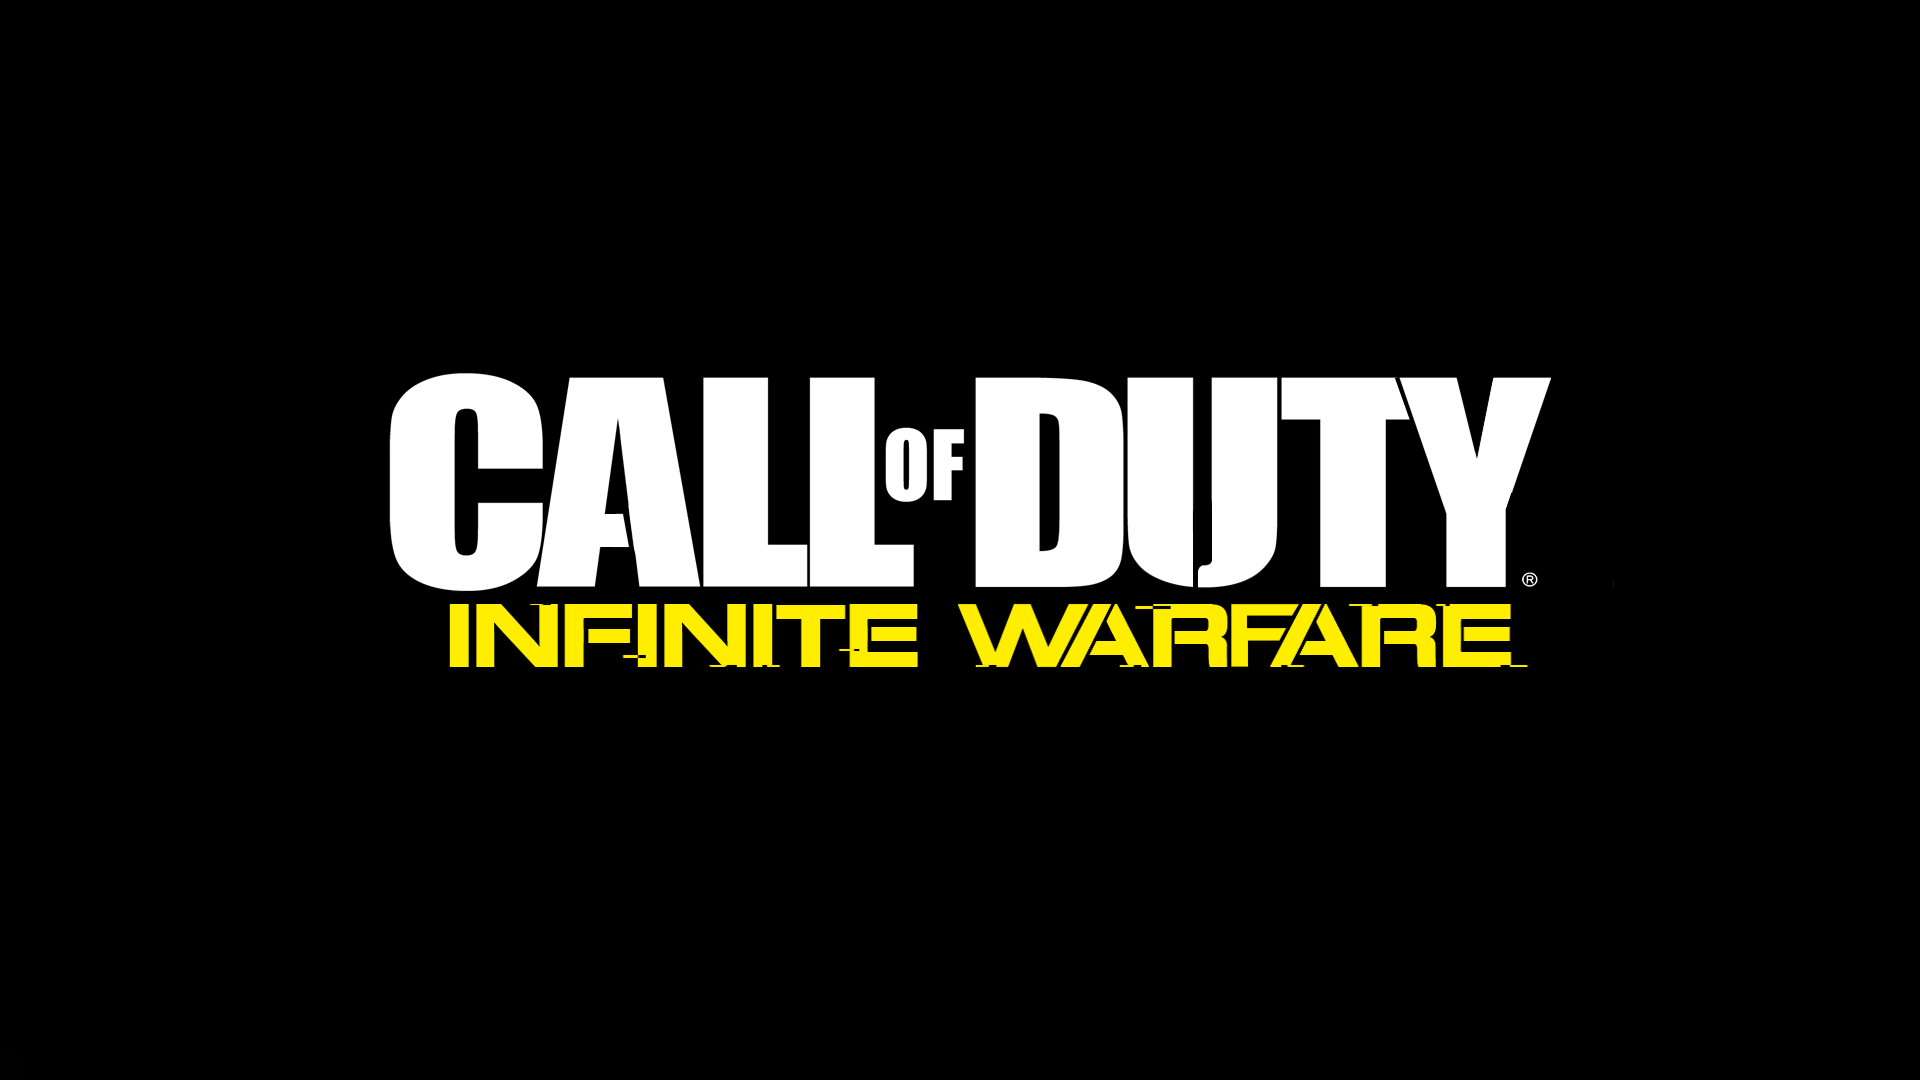 Call Of Duty Infinite Warfare Logo Wallpaper 58065 ...